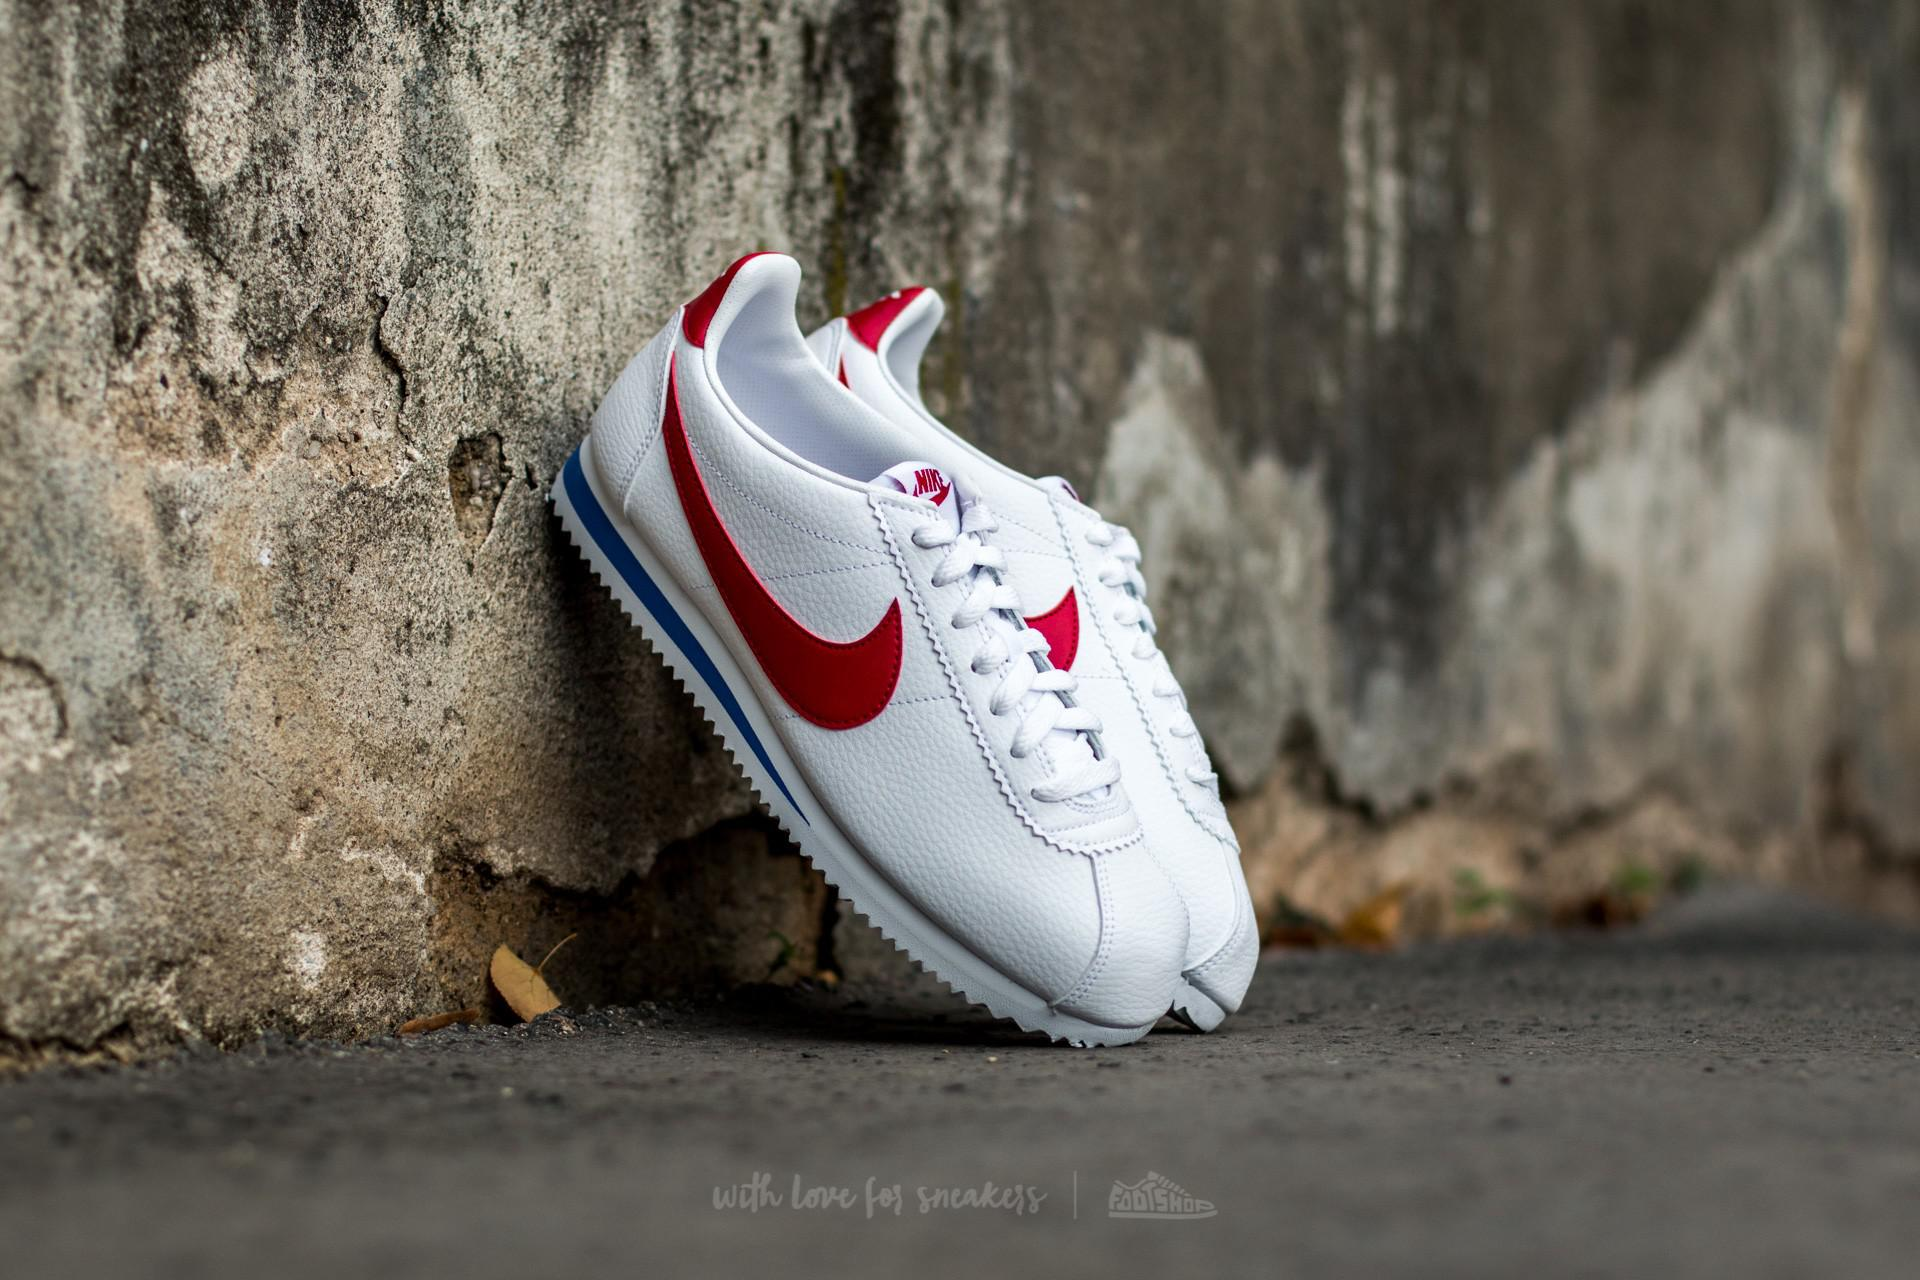 ebe2384220522b Lyst - Nike Classic Cortez Leather White  Varsity Red-varsity Royal ...